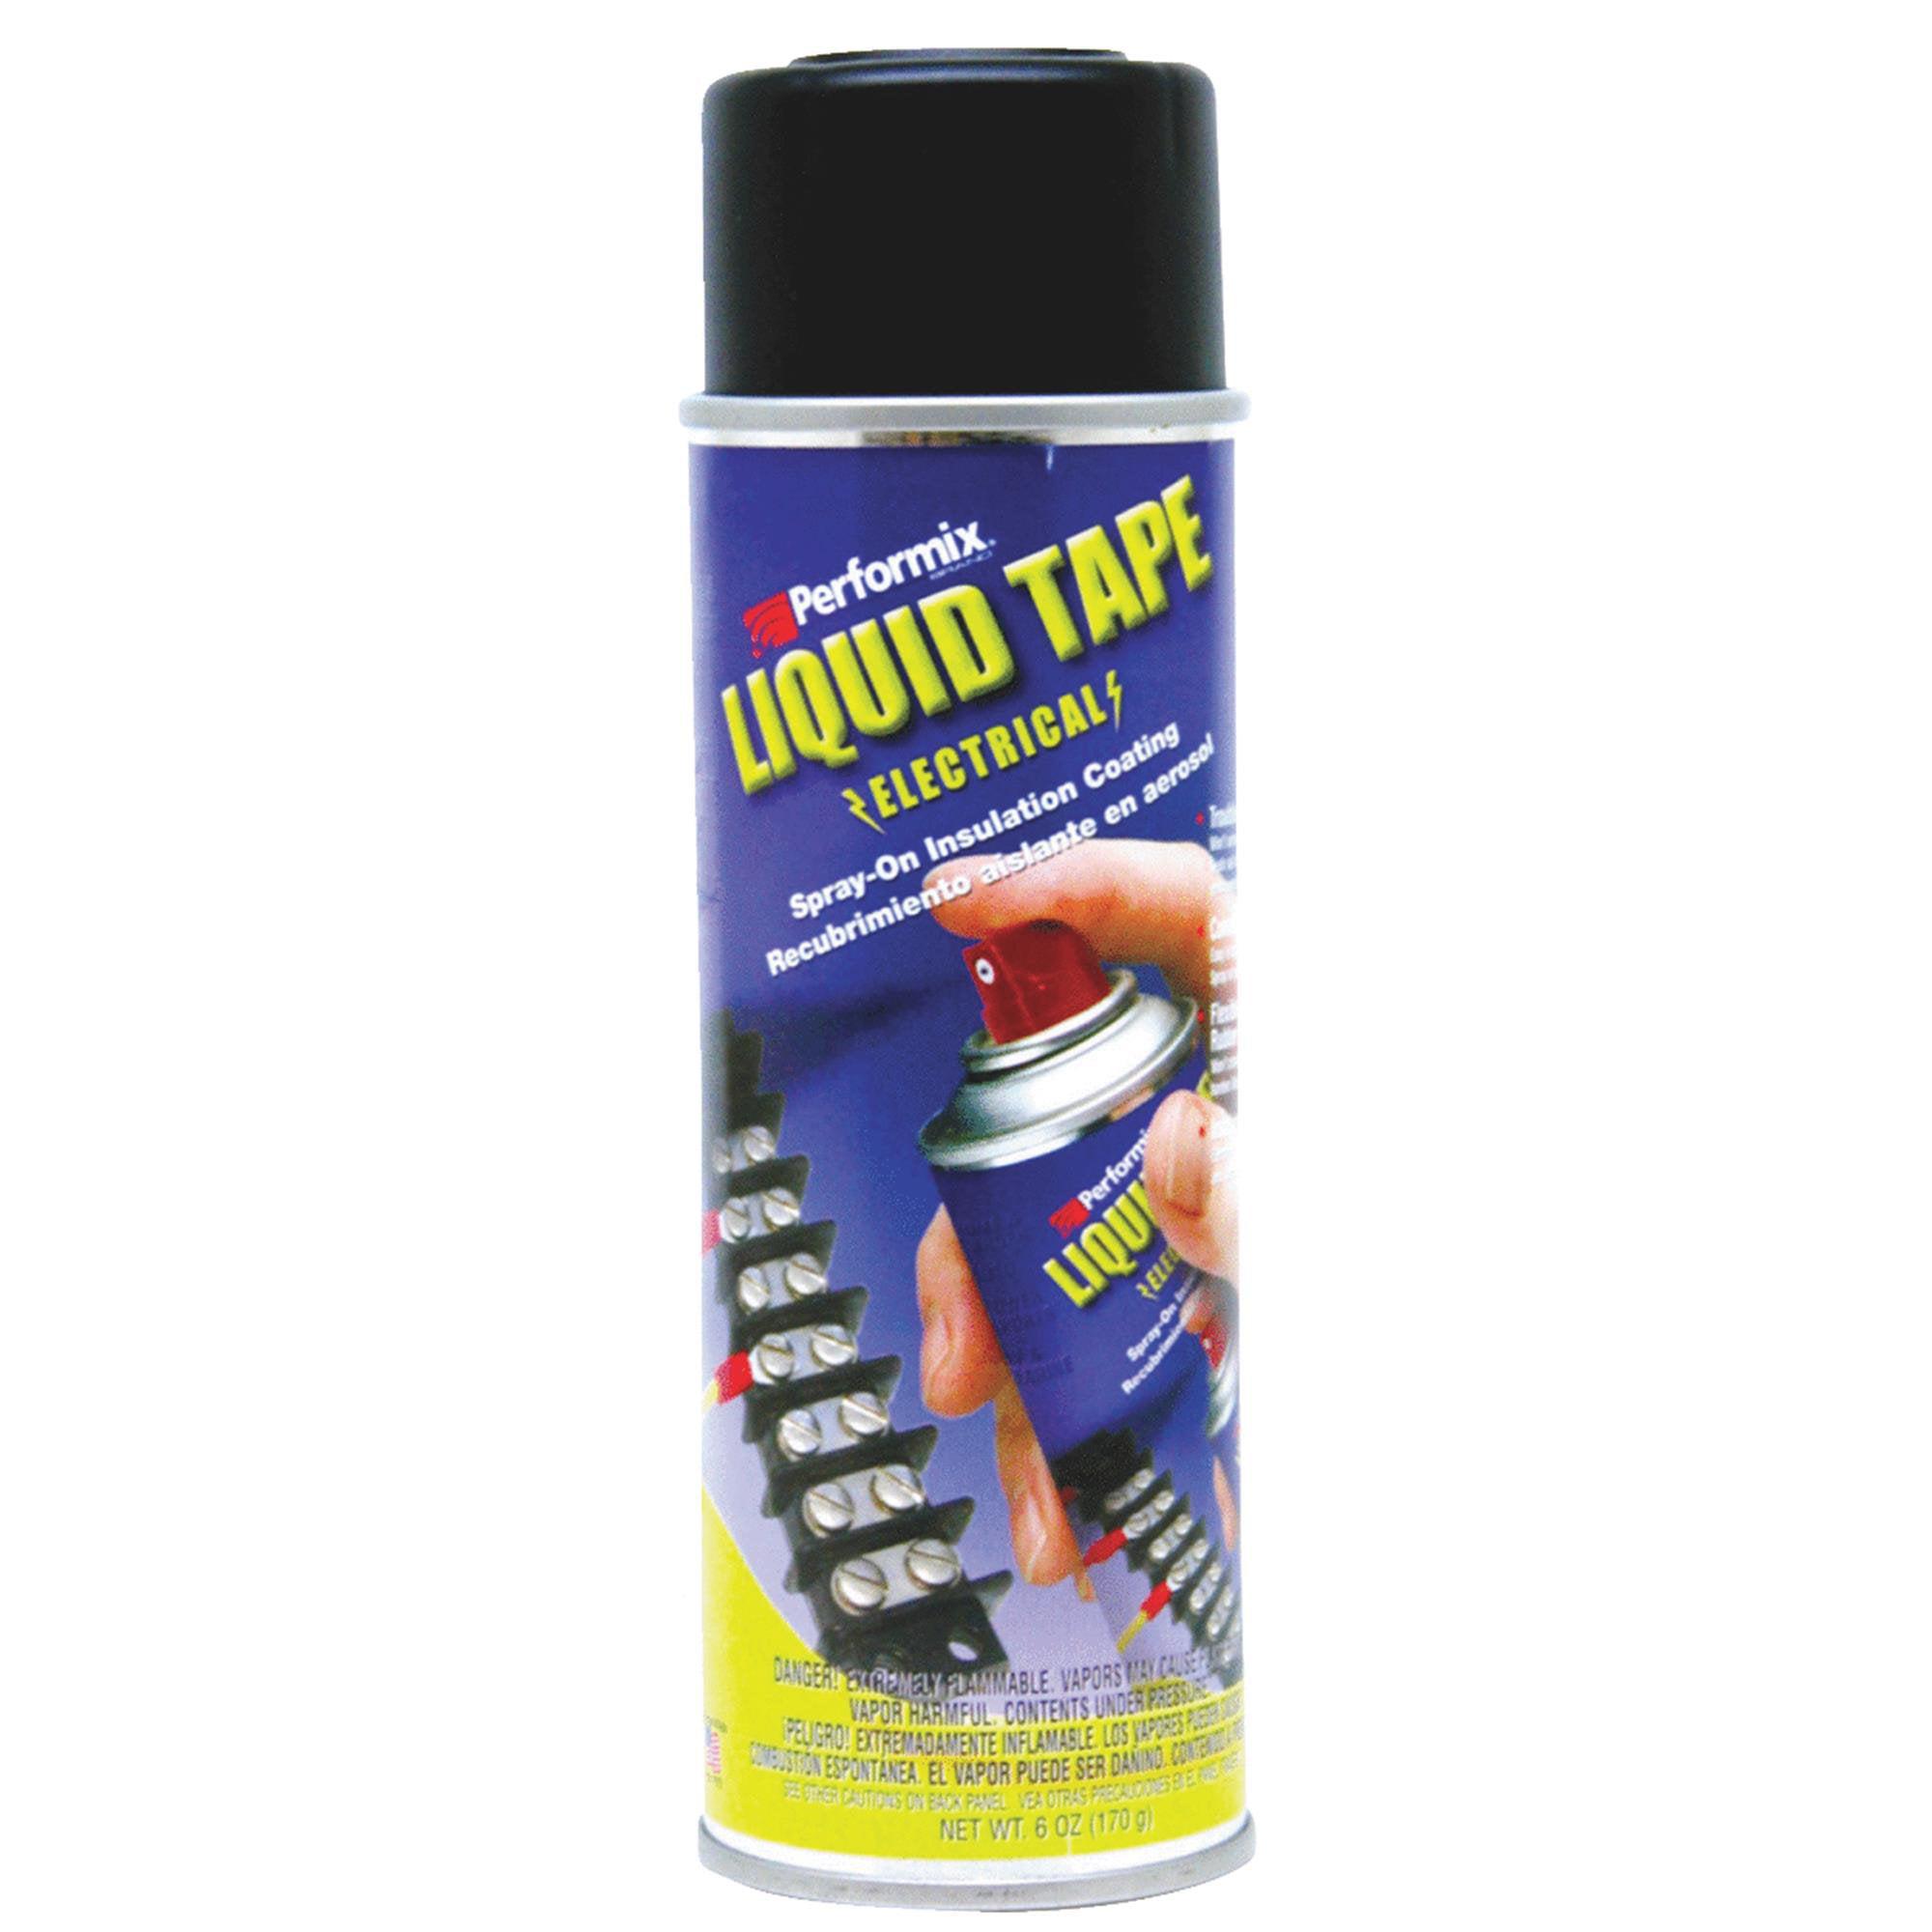 Performix Plasti Dip 16003 Liquid Electrical Tape Coating, Black, 6 oz.